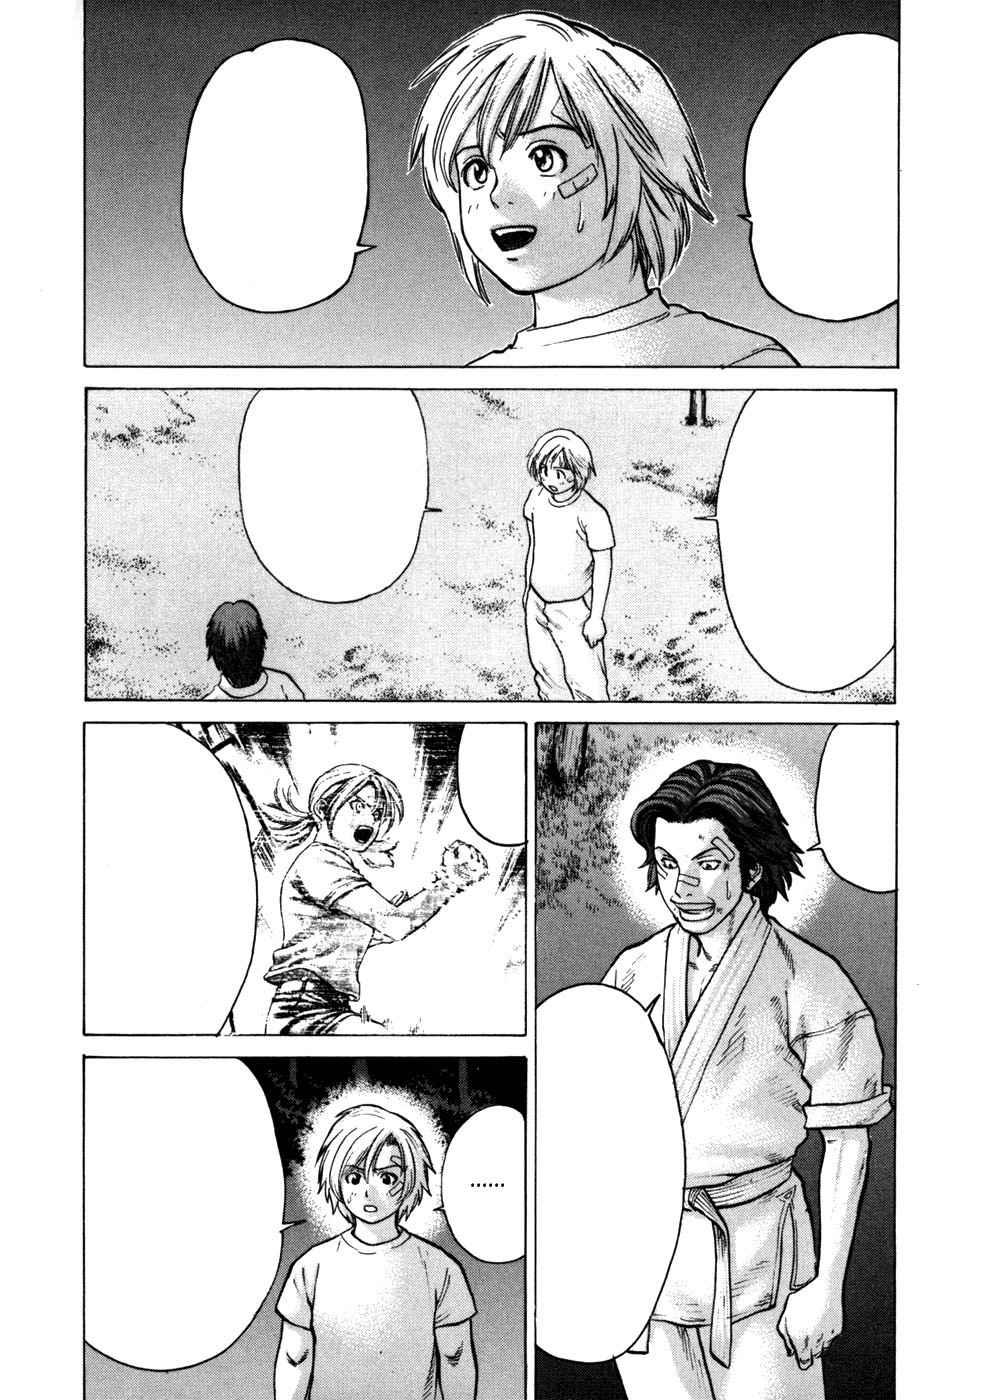 http://c5.ninemanga.com/es_manga/53/501/454740/0f3d014eead934bbdbacb62a01dc4831.jpg Page 6